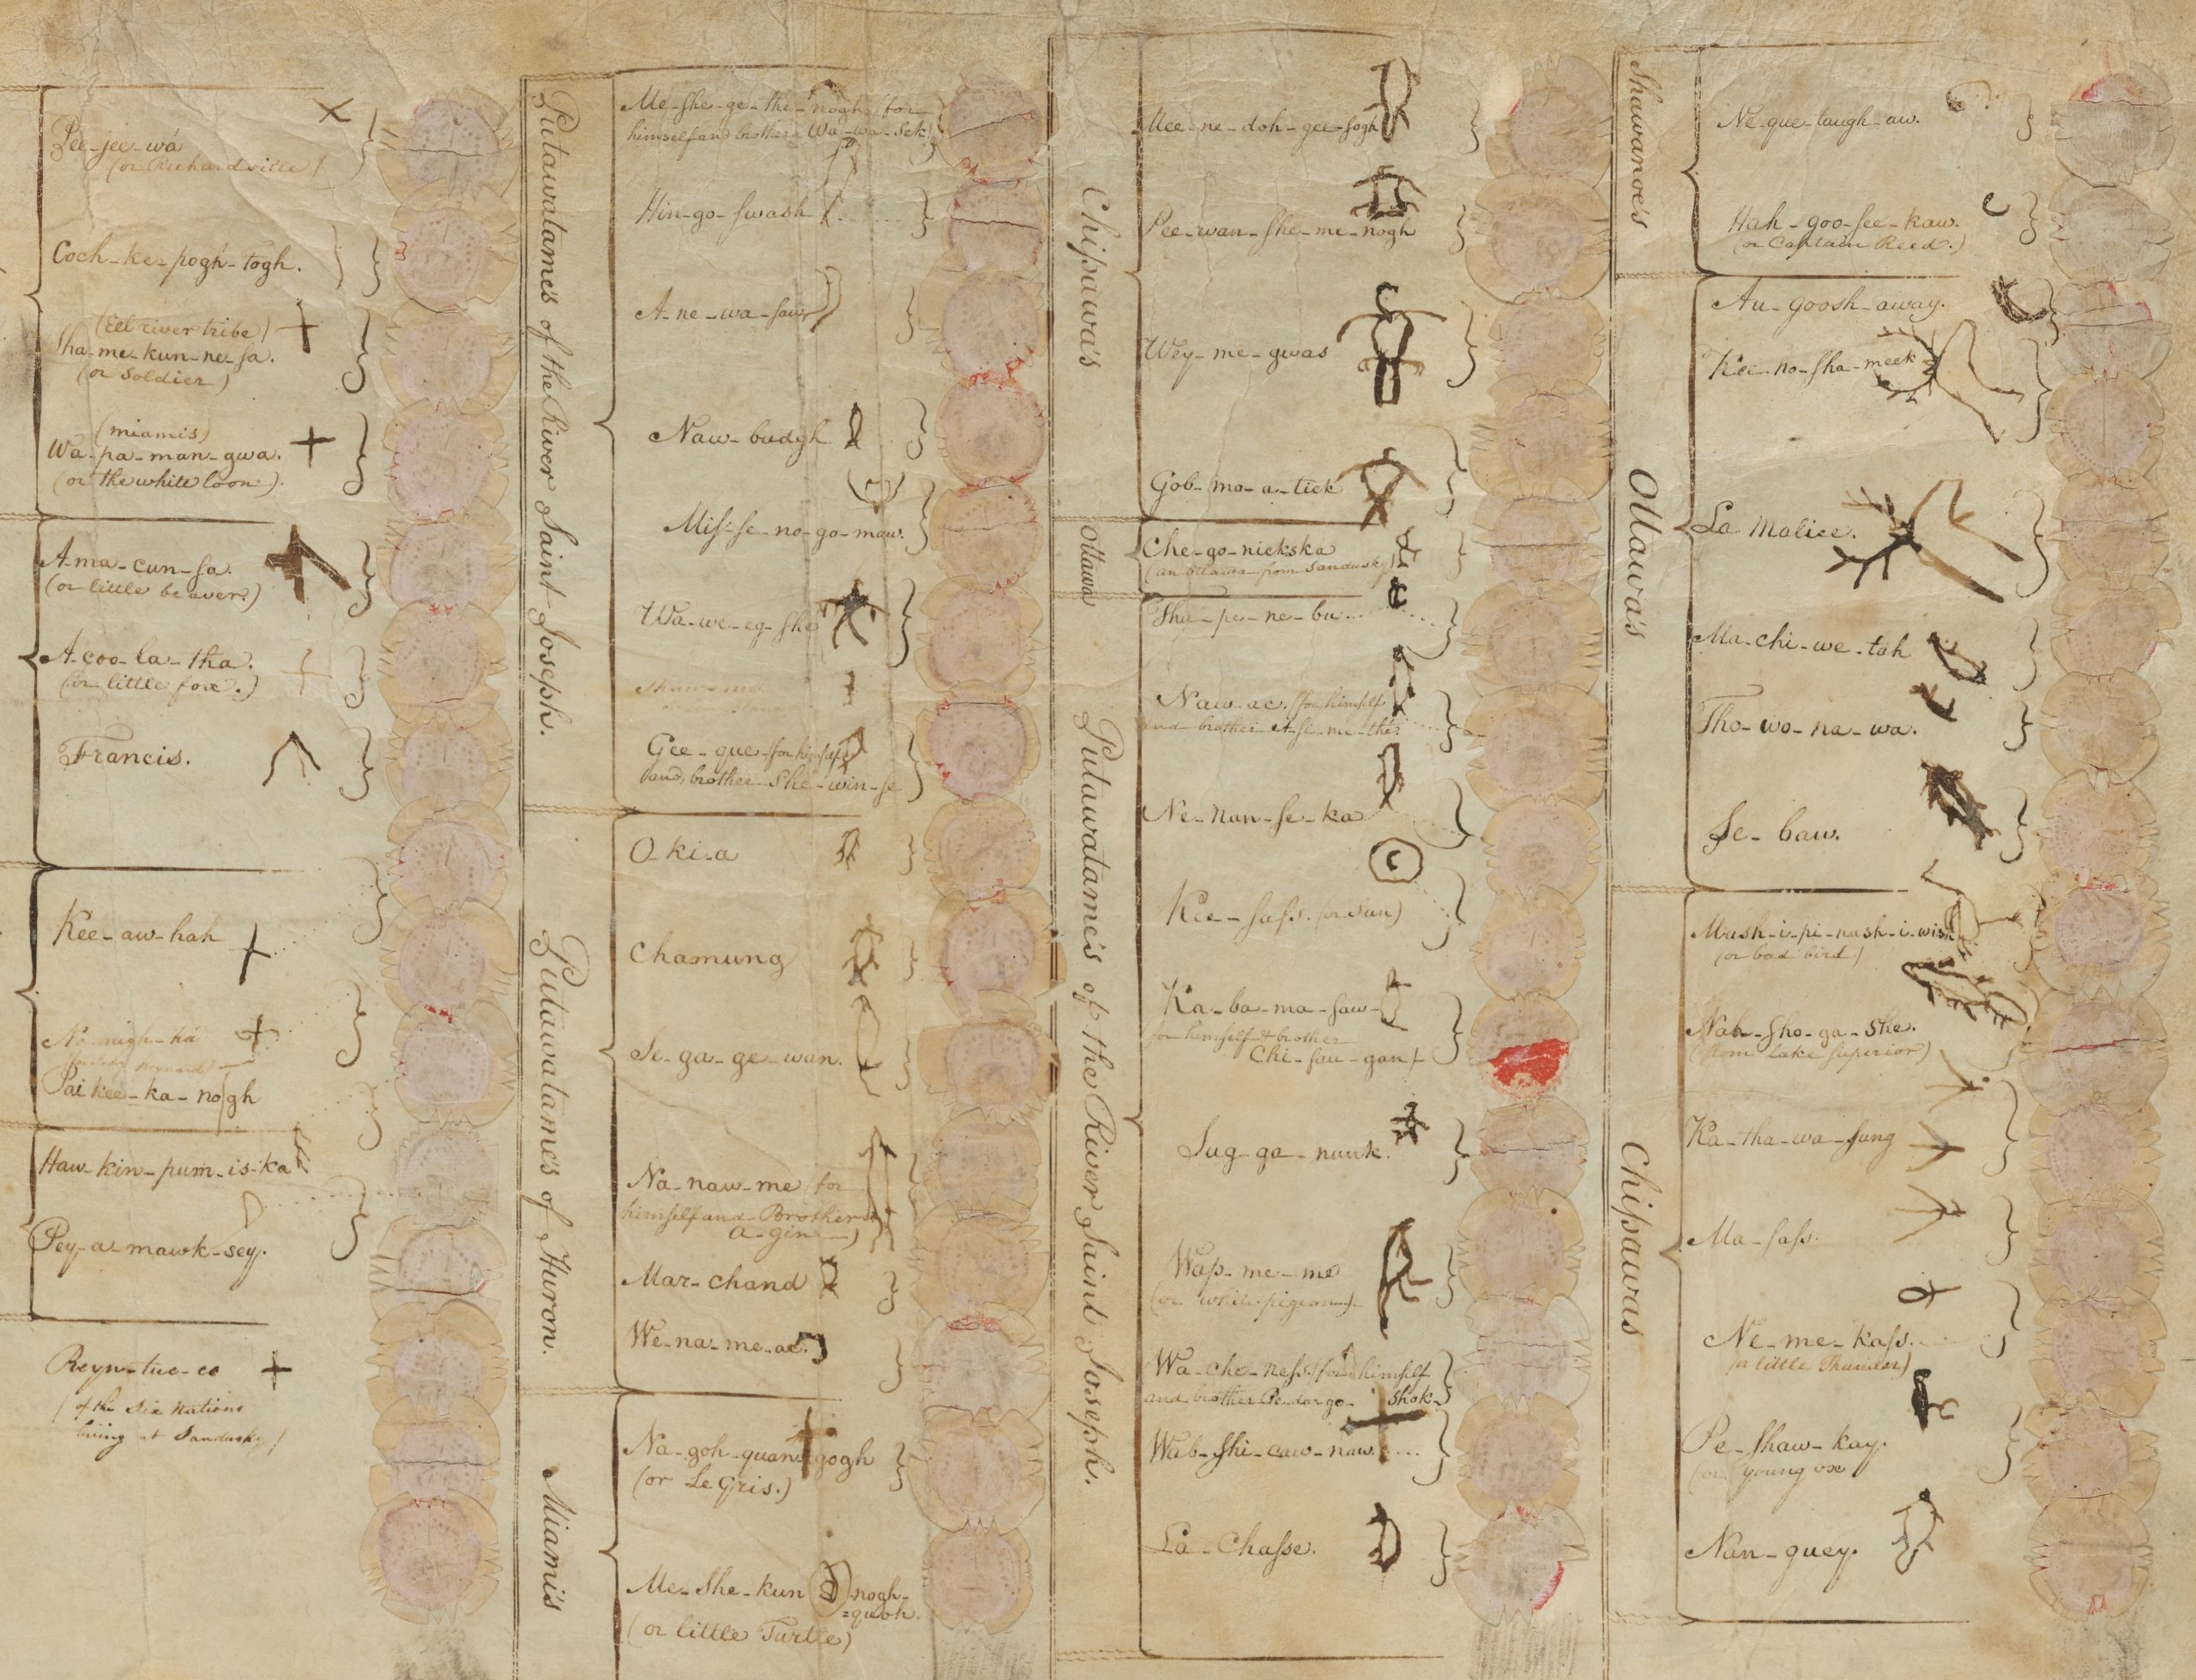 Image of 1795 treaty between the United States government and representatives of the Wyandot, Delaware, Shawnee, Ottawa, Chippewa, Potawatomi, Eel River, Wea, Kickapoo, Plankeshaw, and Kaskaskia peoples.